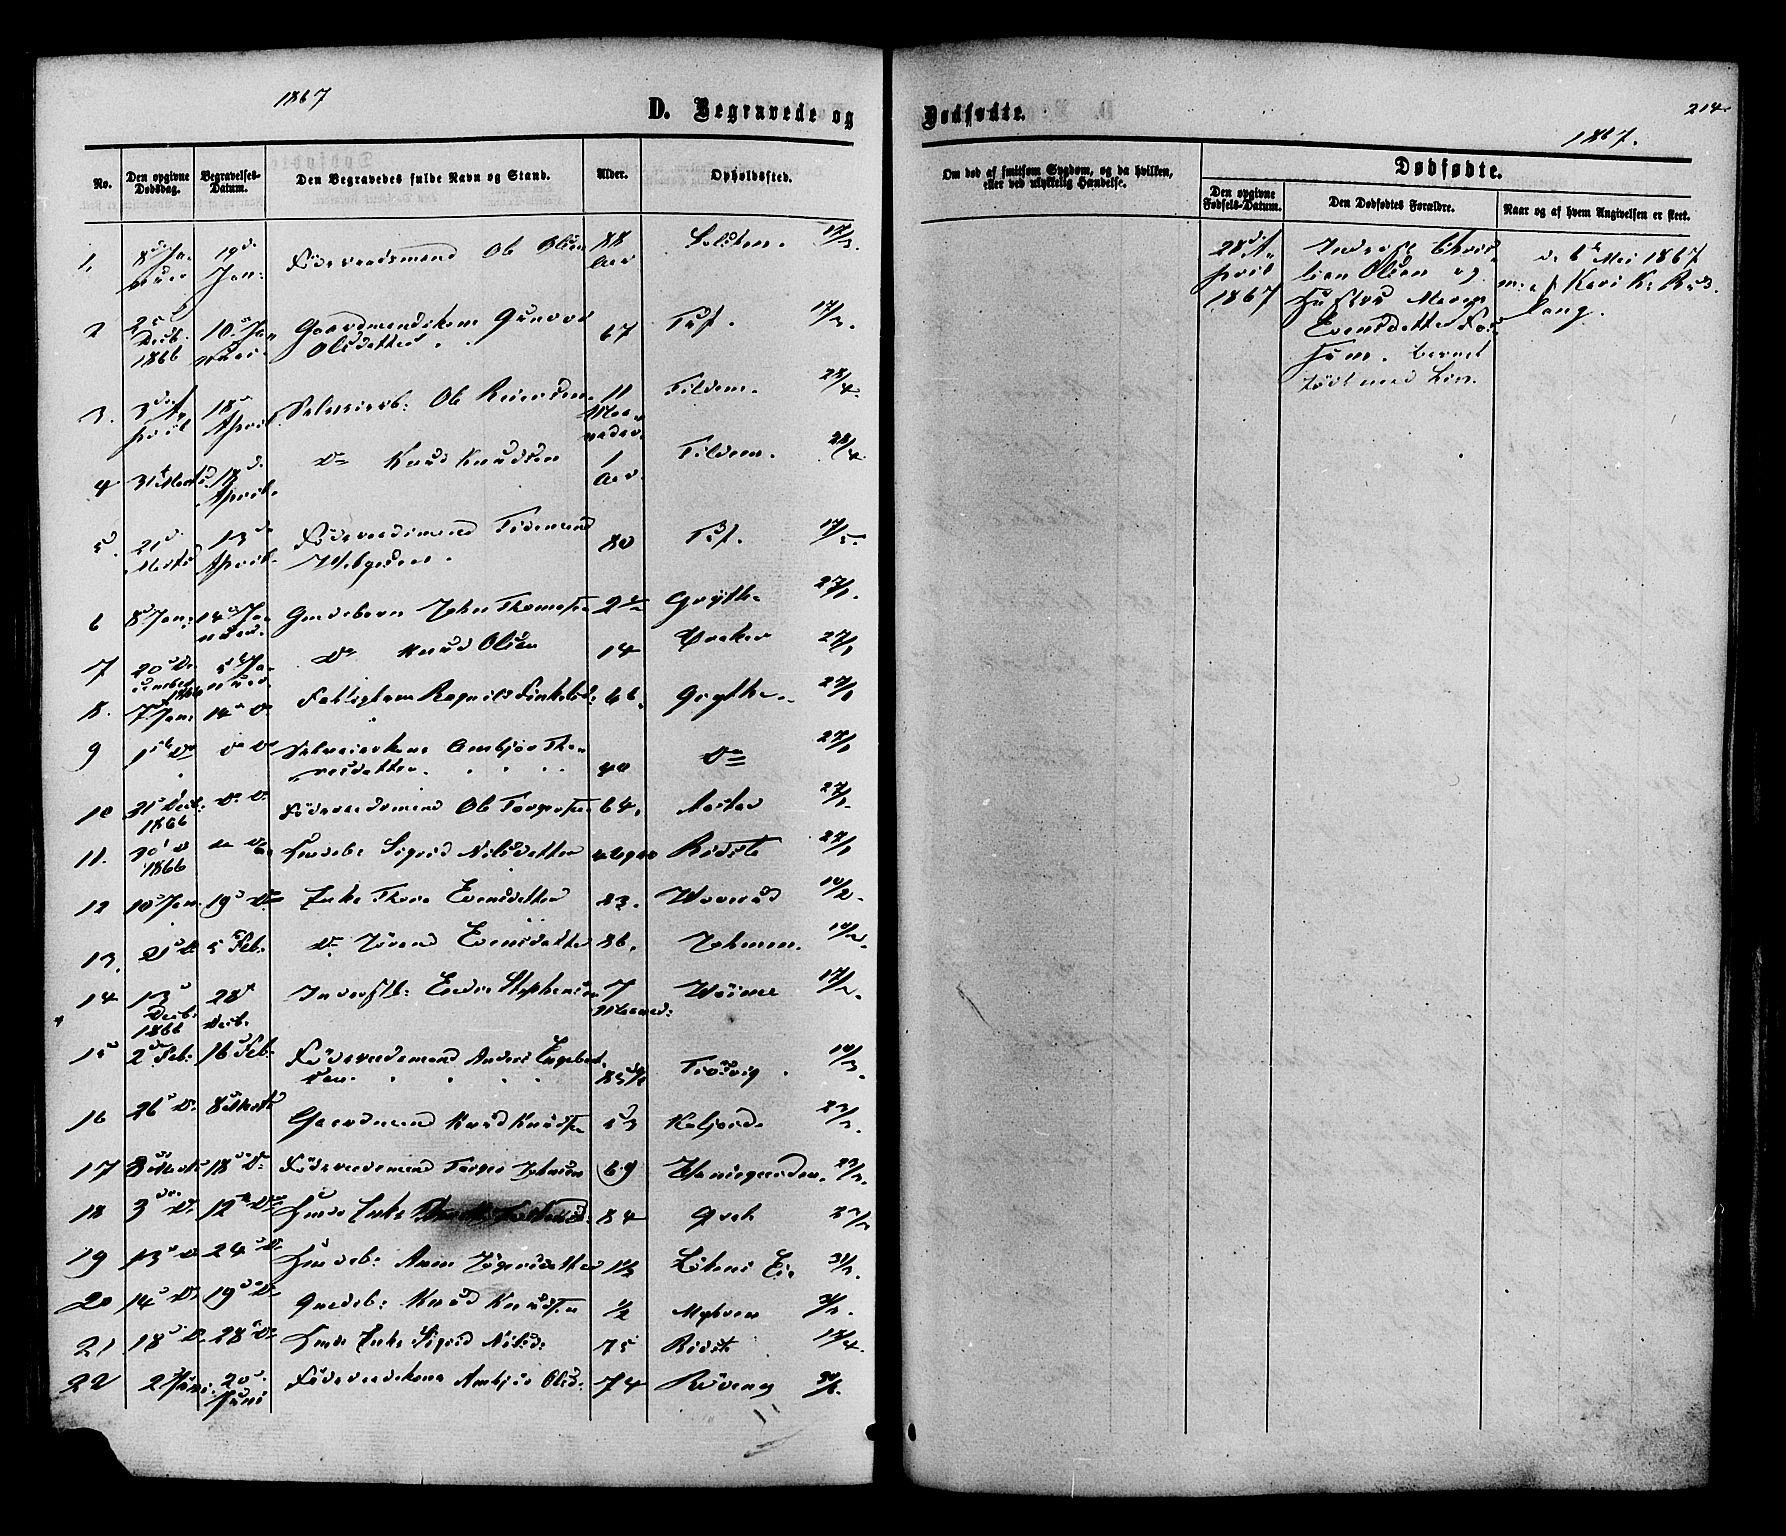 SAH, Vestre Slidre prestekontor, Ministerialbok nr. 3, 1865-1880, s. 214